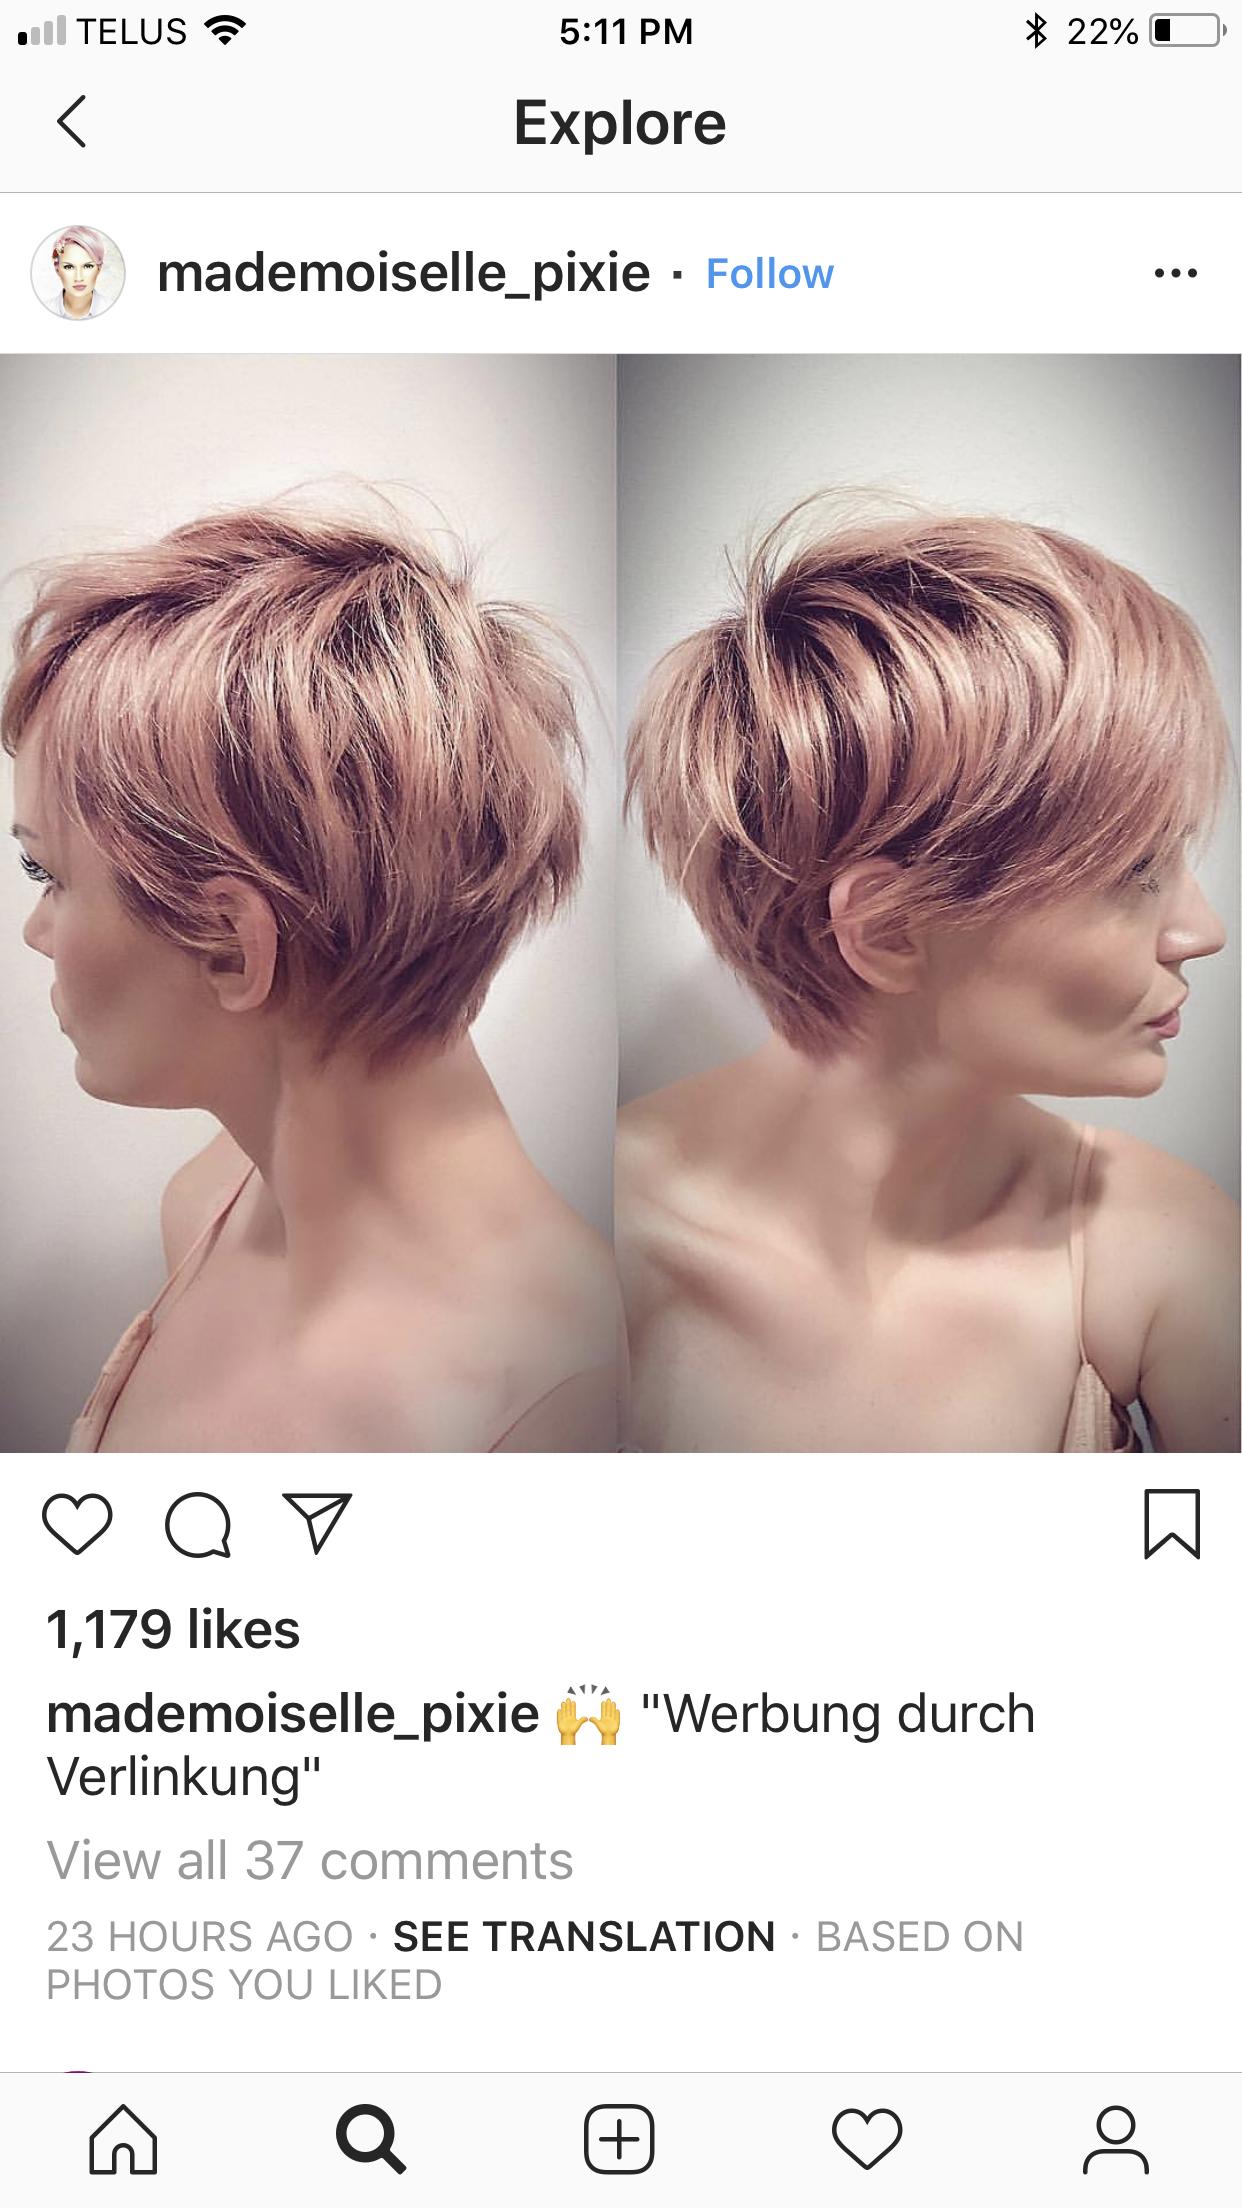 Hairpeinadosfiesta In 2020 Frisuren Frisuren Kurze Haare Braun Haarschnitt Kurz